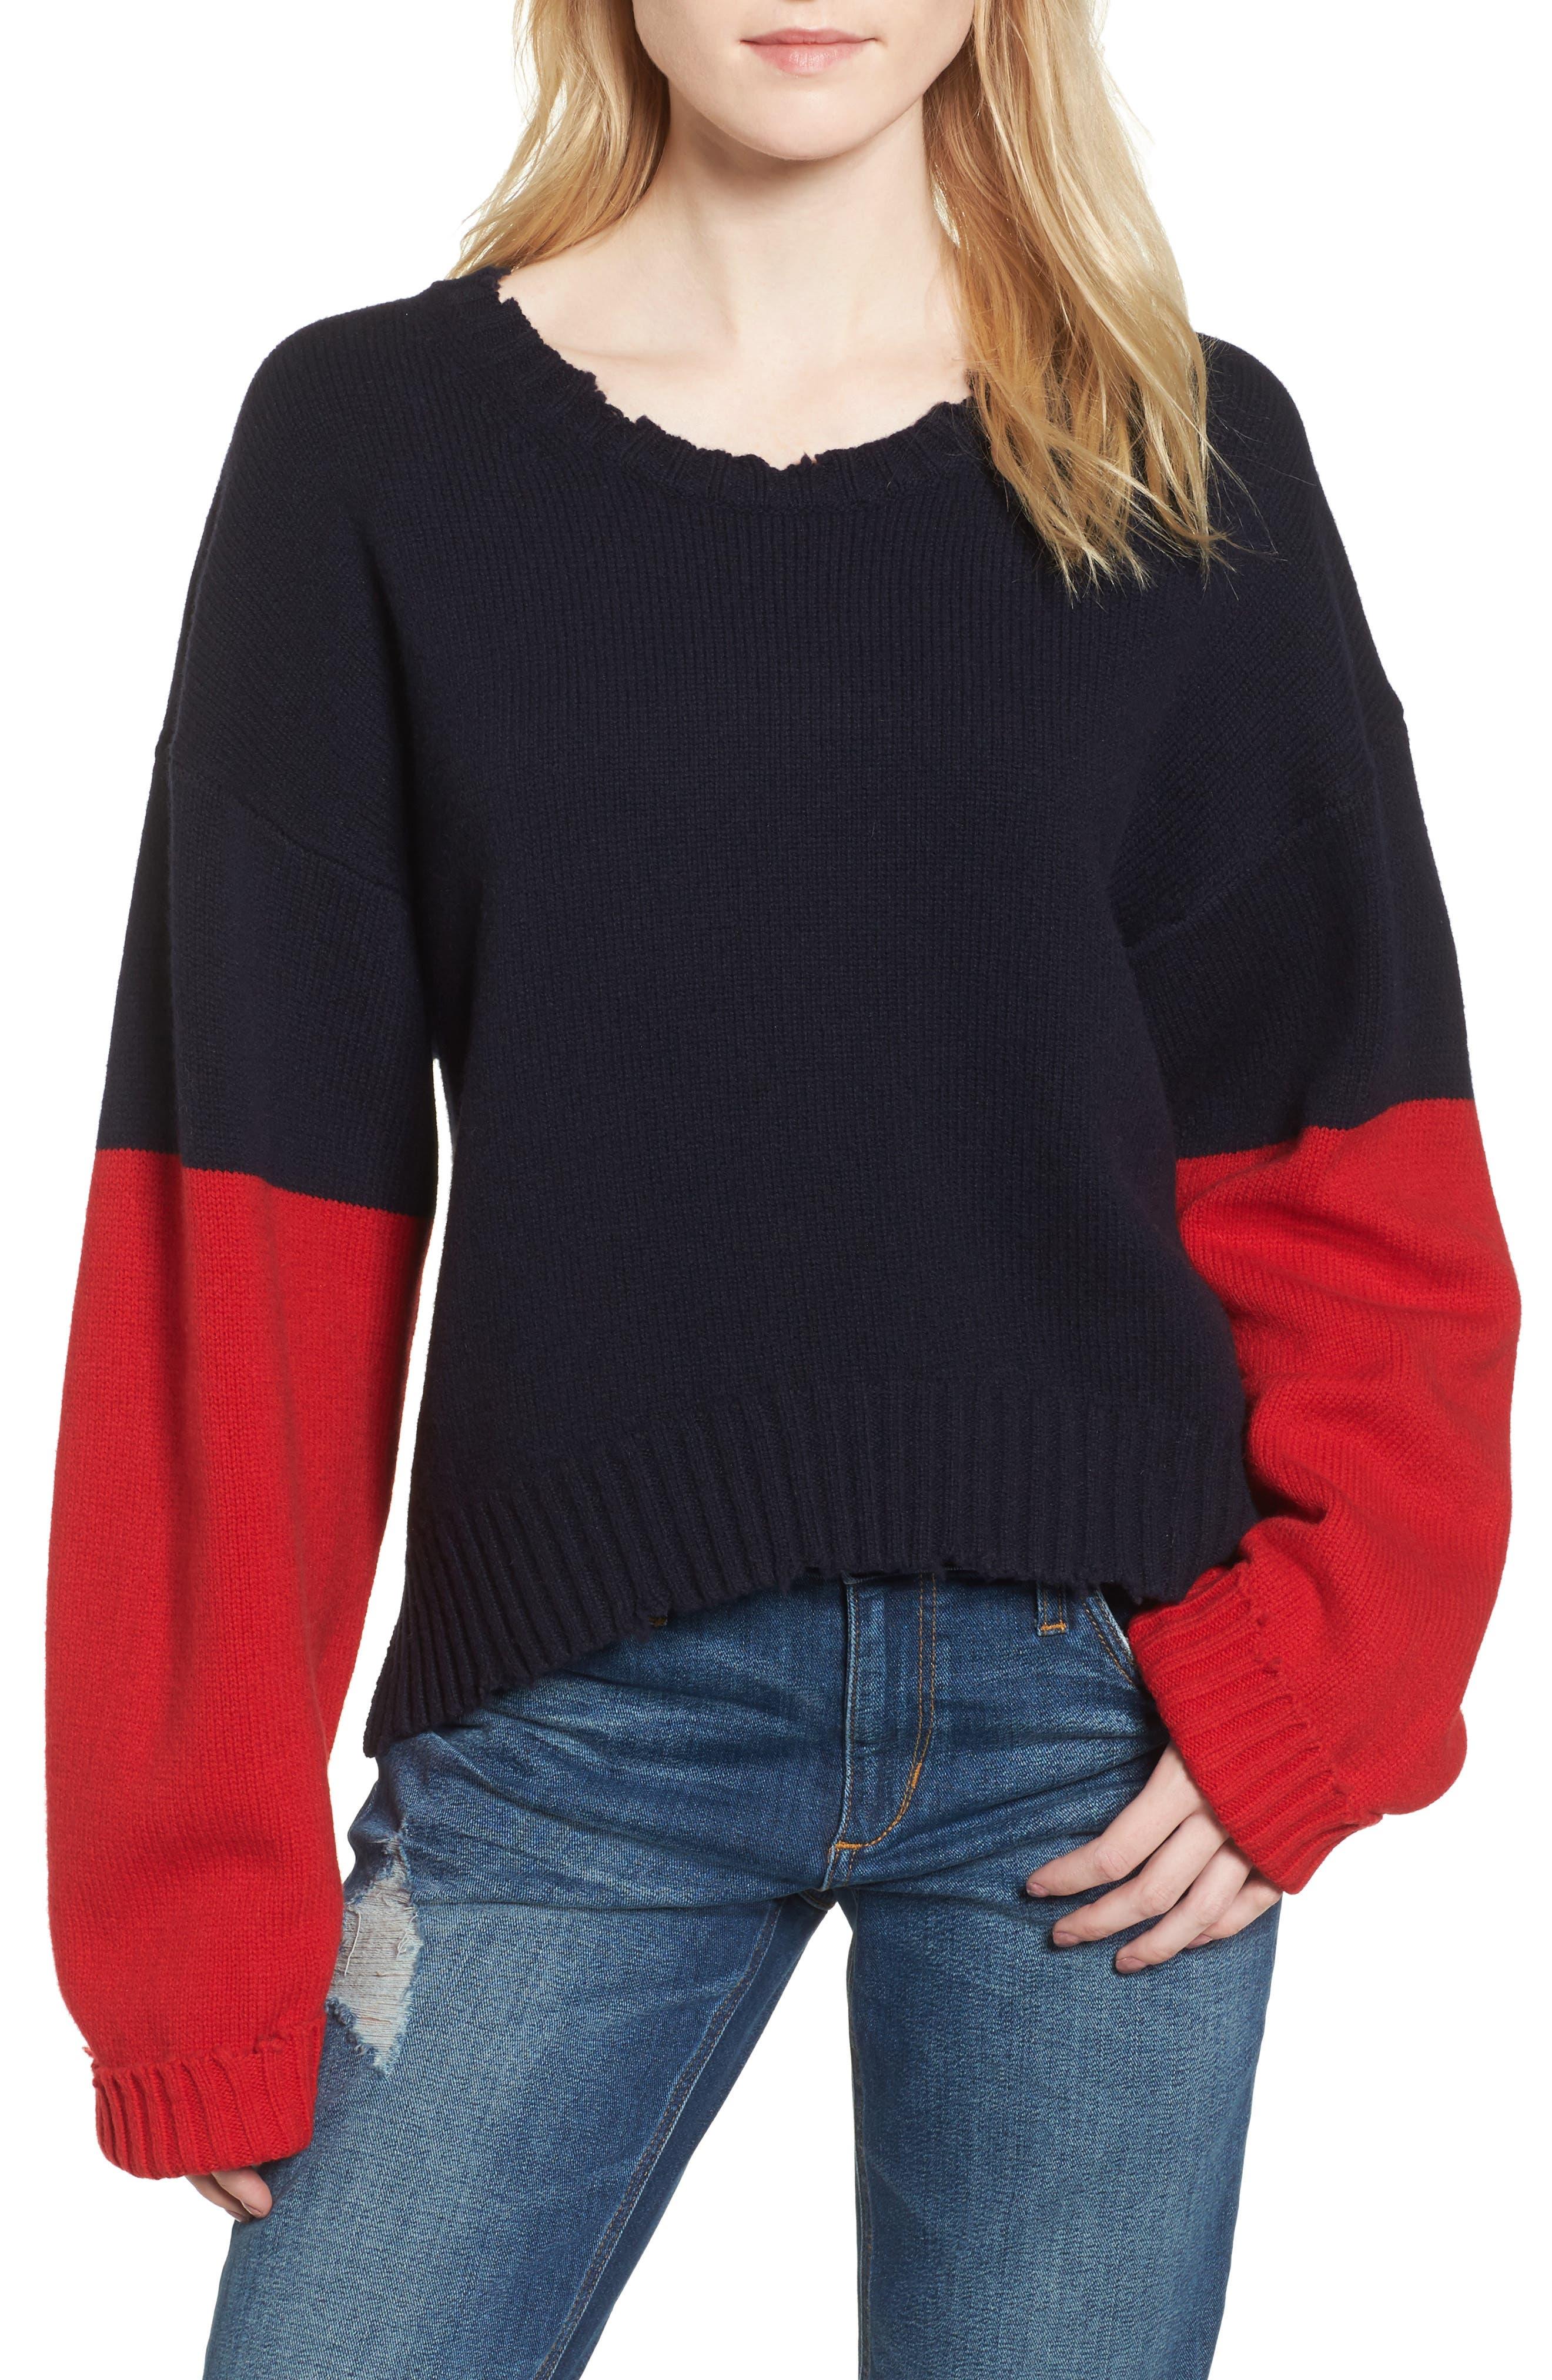 Clarys Sweater,                         Main,                         color, Oxford